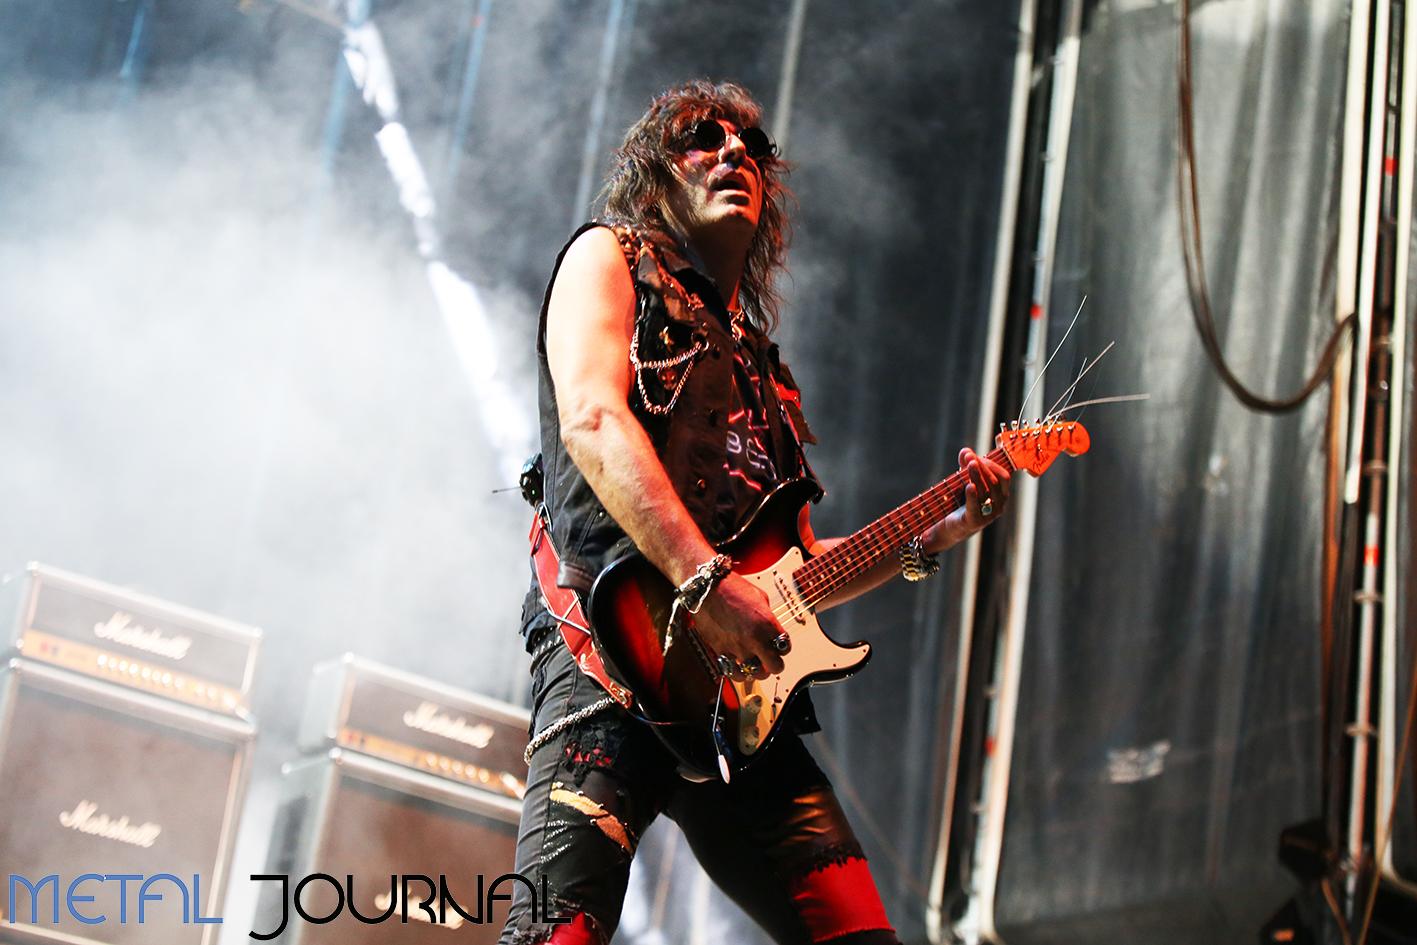 rata blanca - leyendas del rock 2019 metal journal pic 8